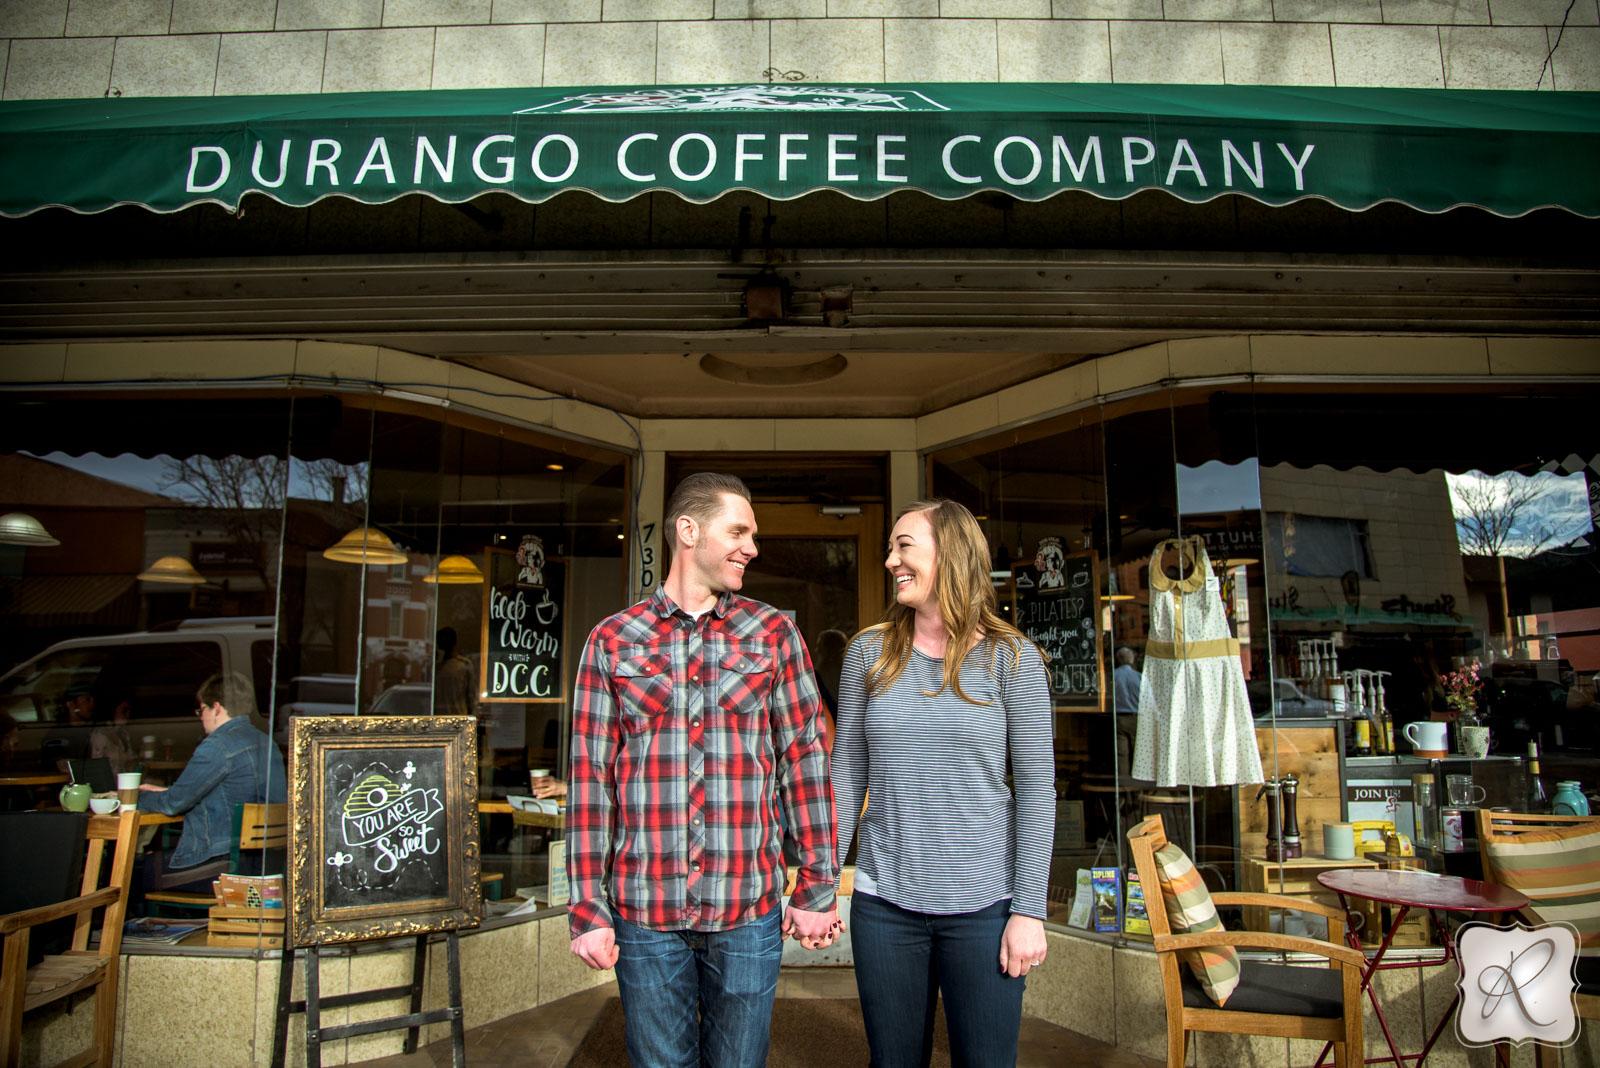 Durango Coffee Company